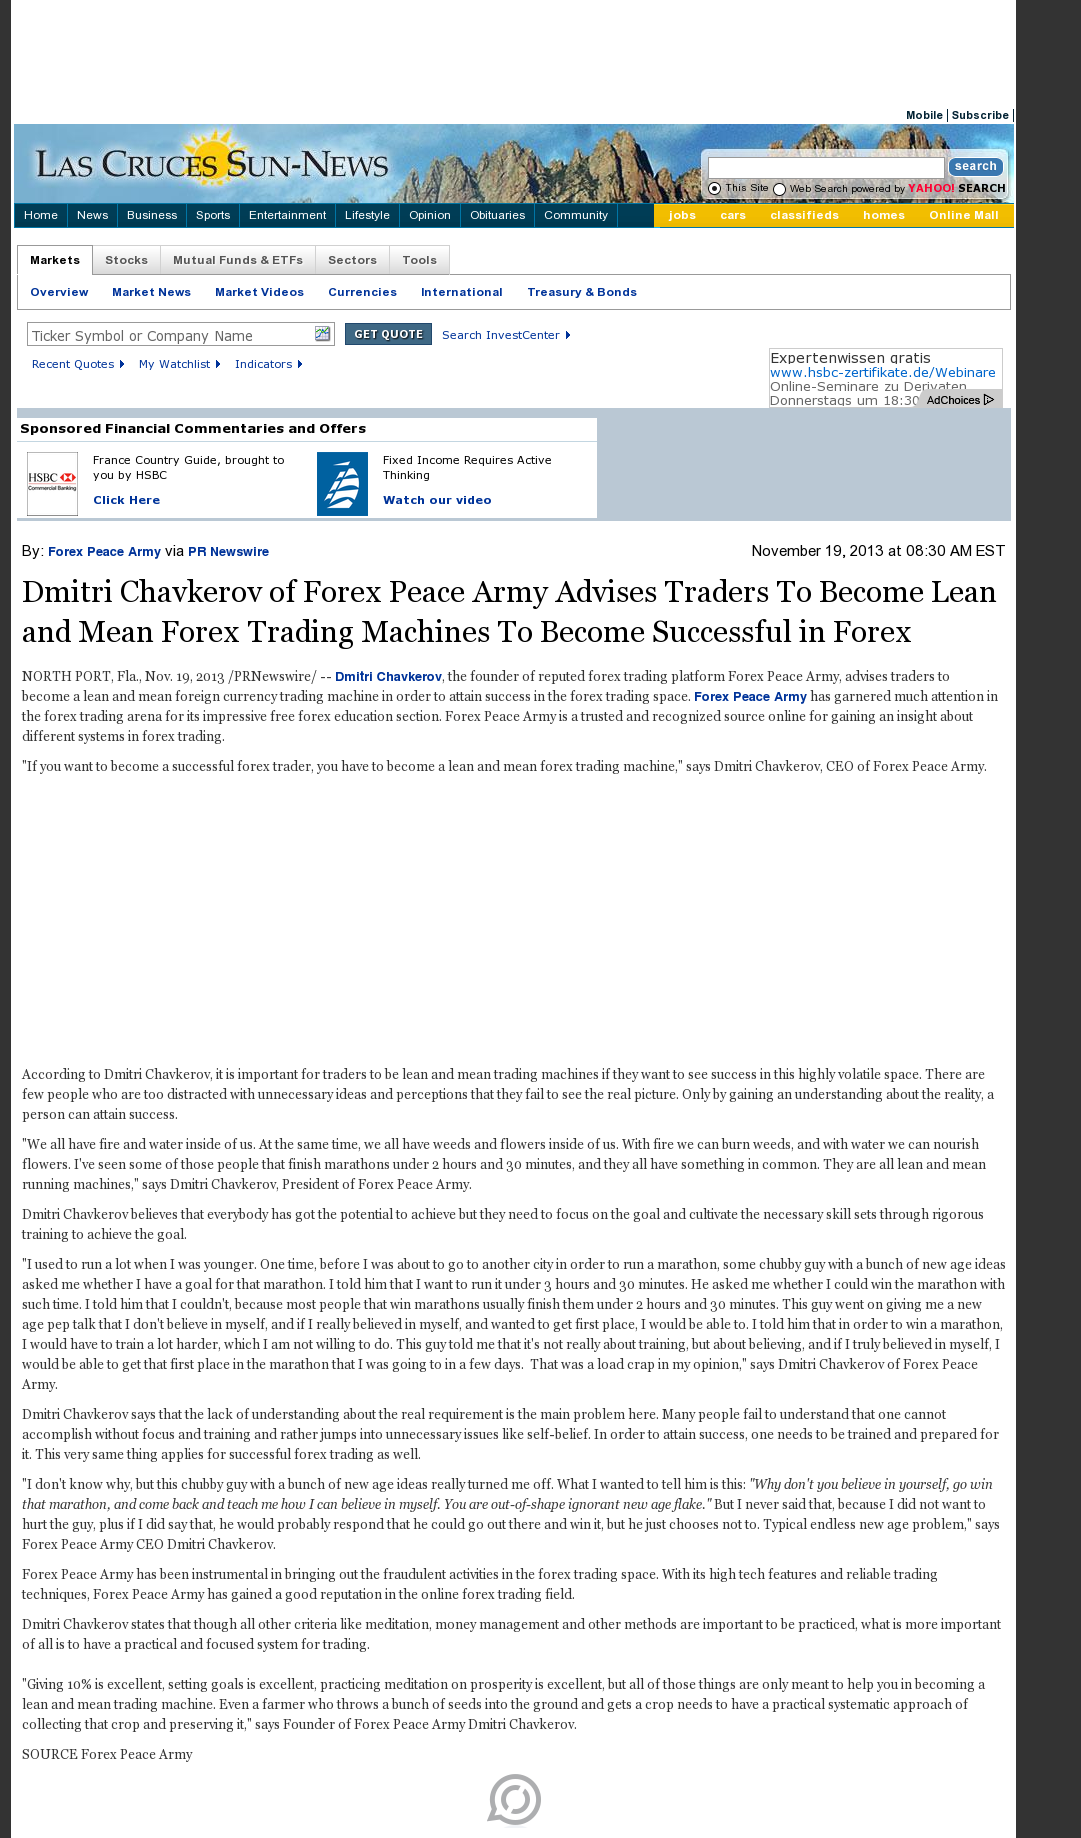 Dmitri Chavkerov - Las Cruces Sun-News - Lean Forex Trading